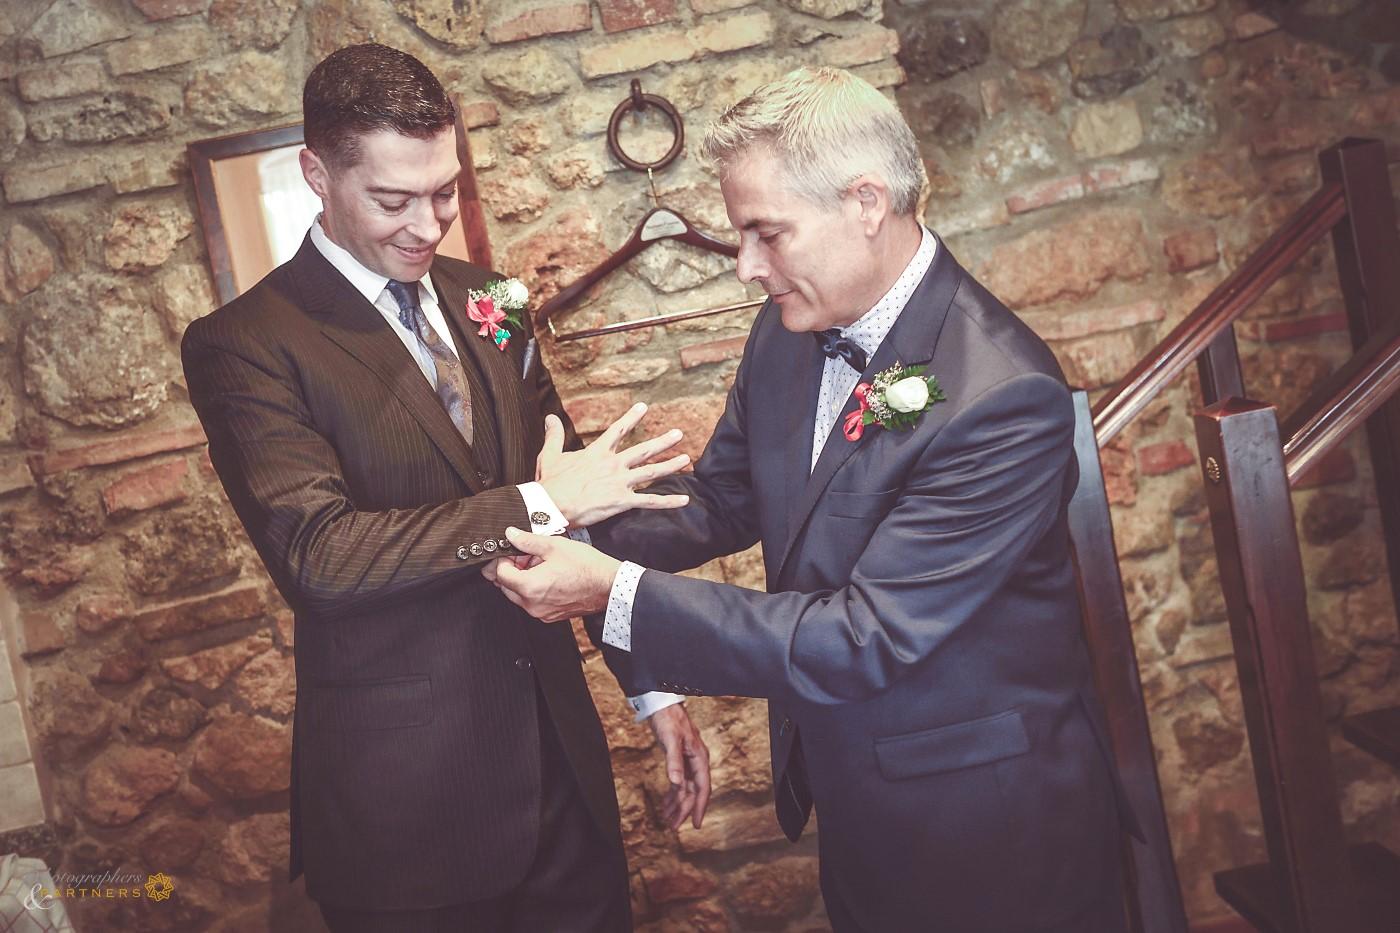 The groom's preparations.